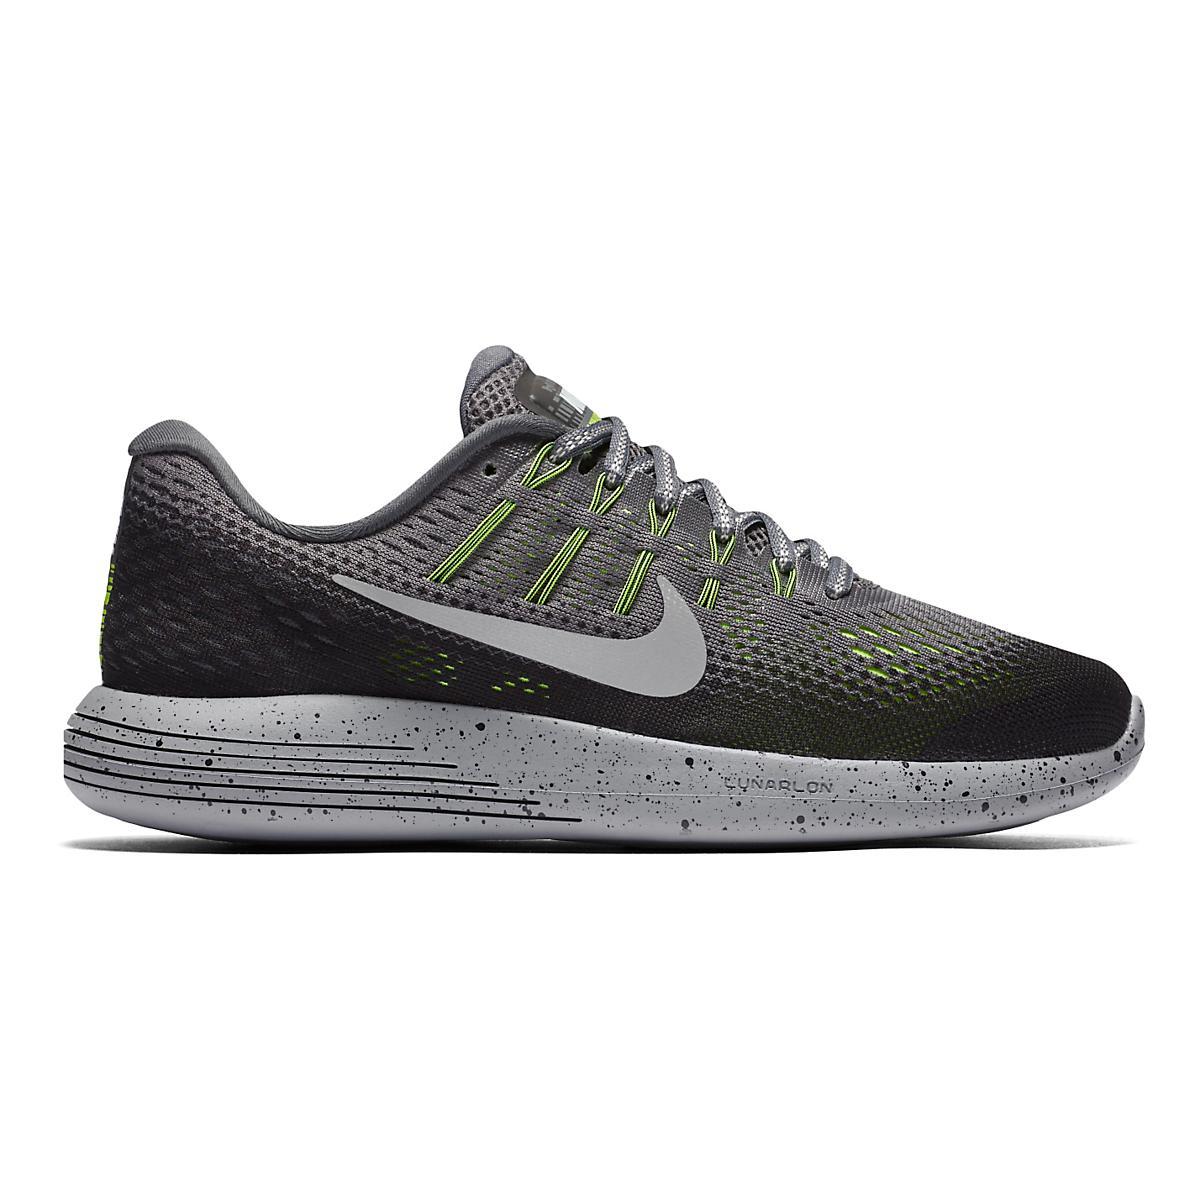 promo code 5473f 69cf2 Womens Nike LunarGlide 8 Shield Running Shoe at Road Runner Sports